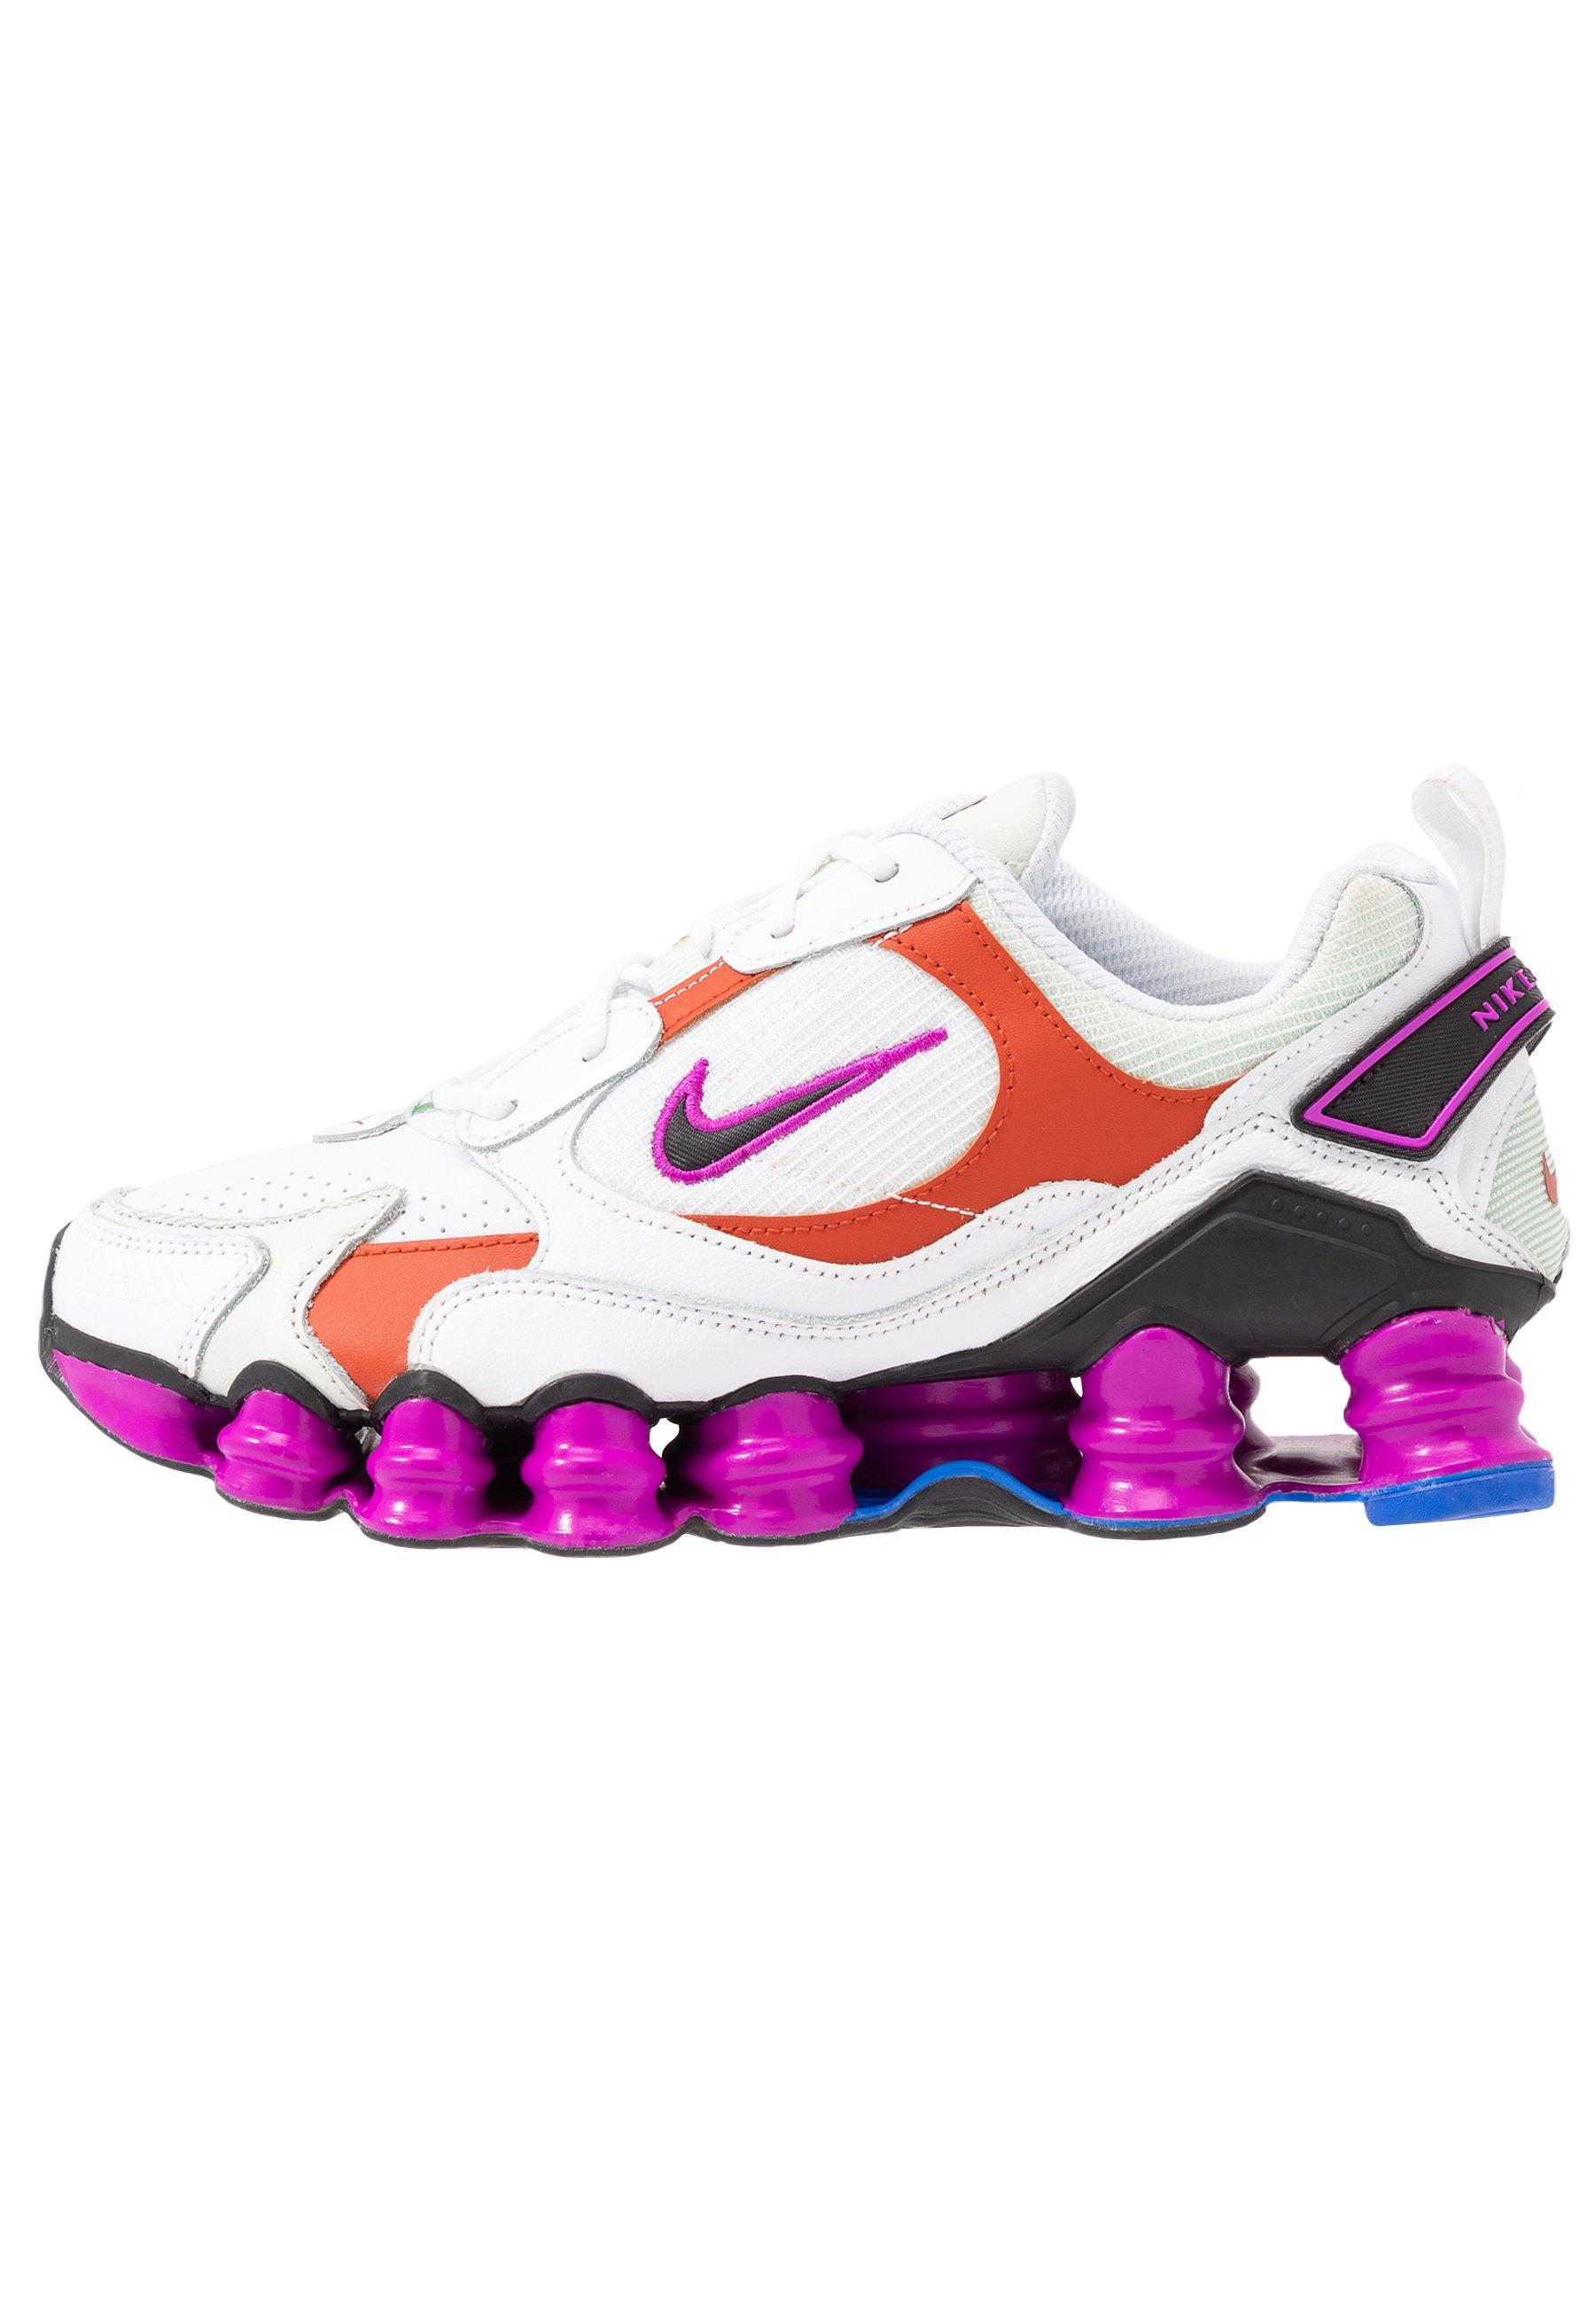 adidas shox tl chaussures